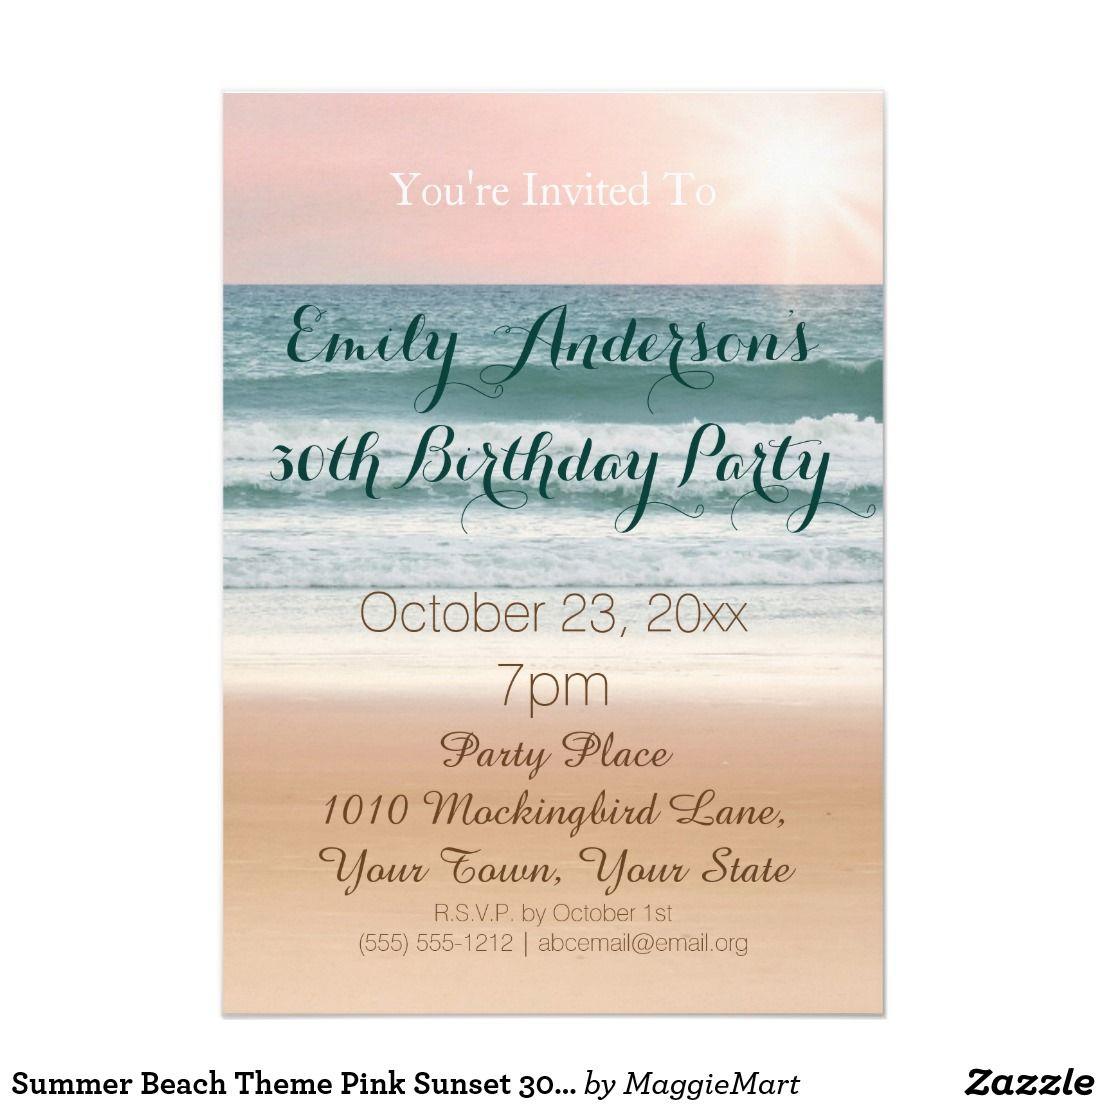 Summer Beach Theme Pink Sunset 30th Birthday Invitation Zazzle